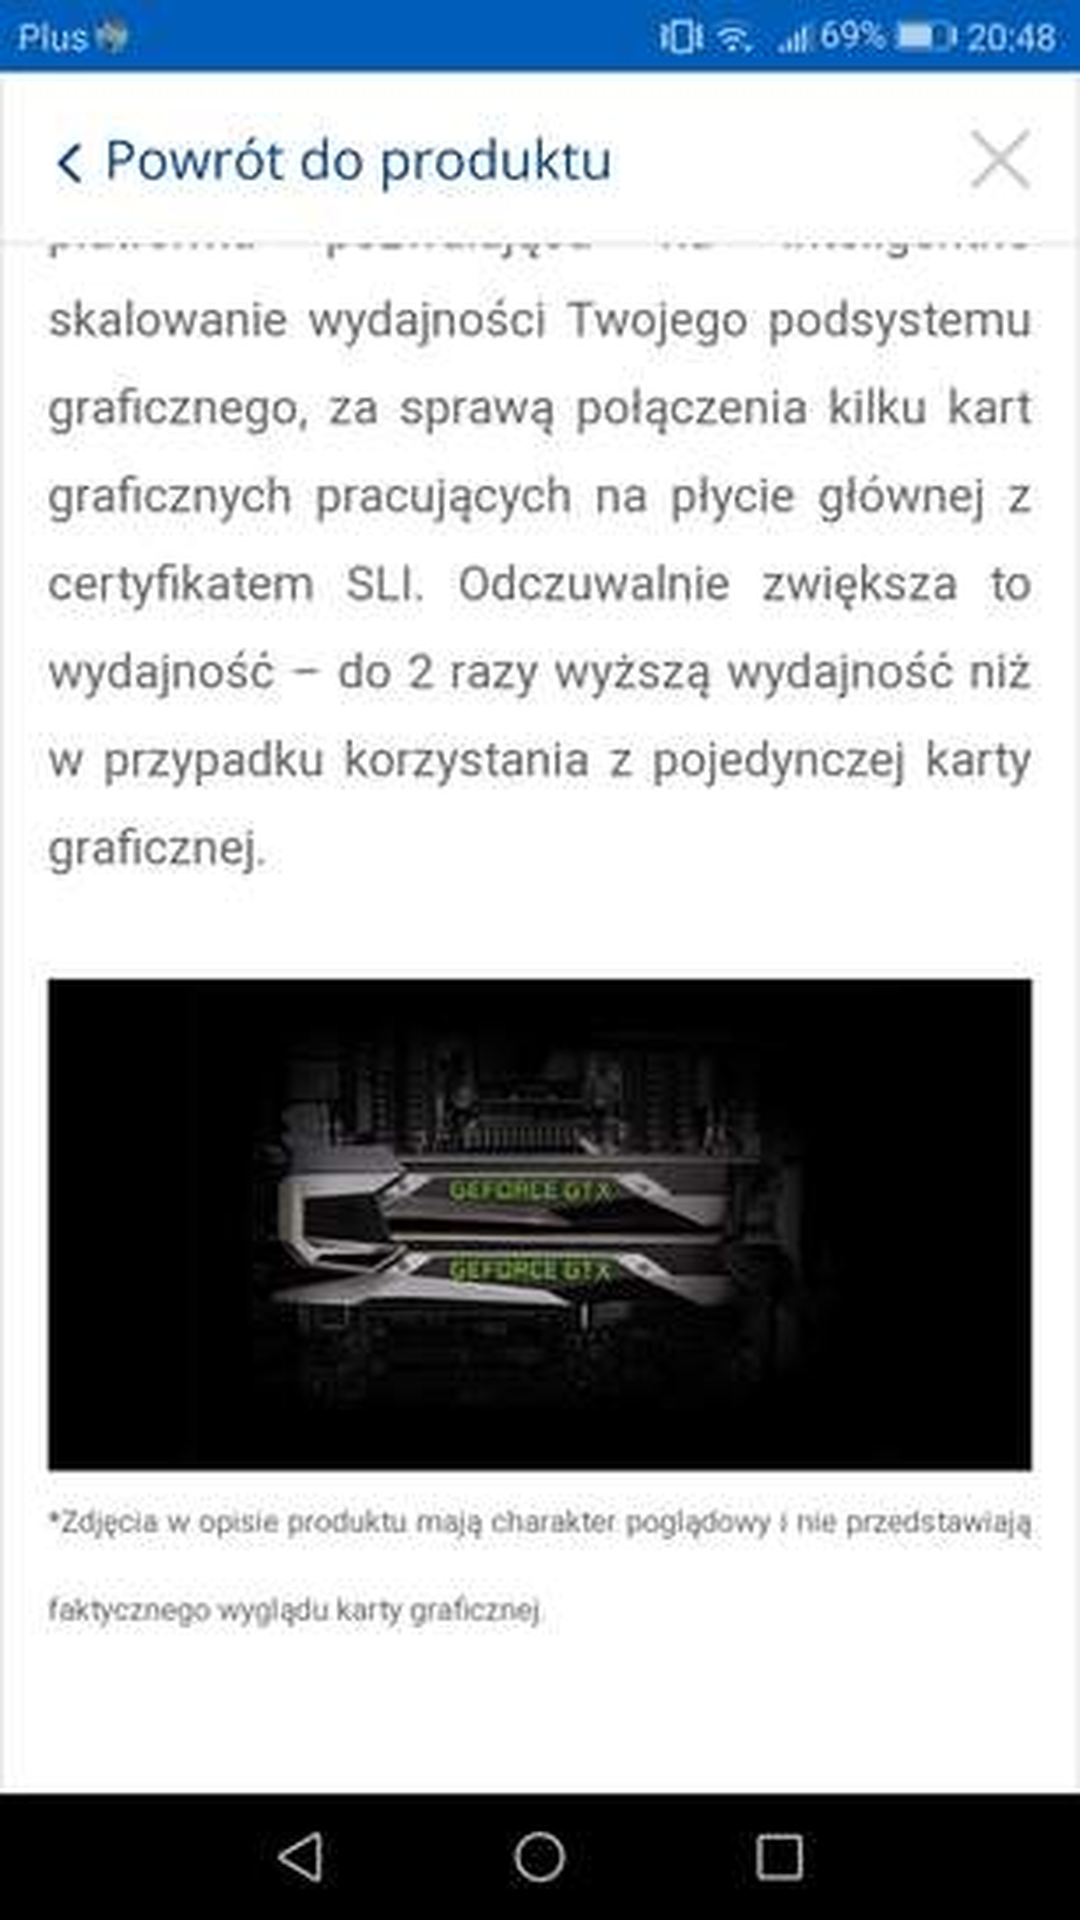 2470241-JzyHm.jpg